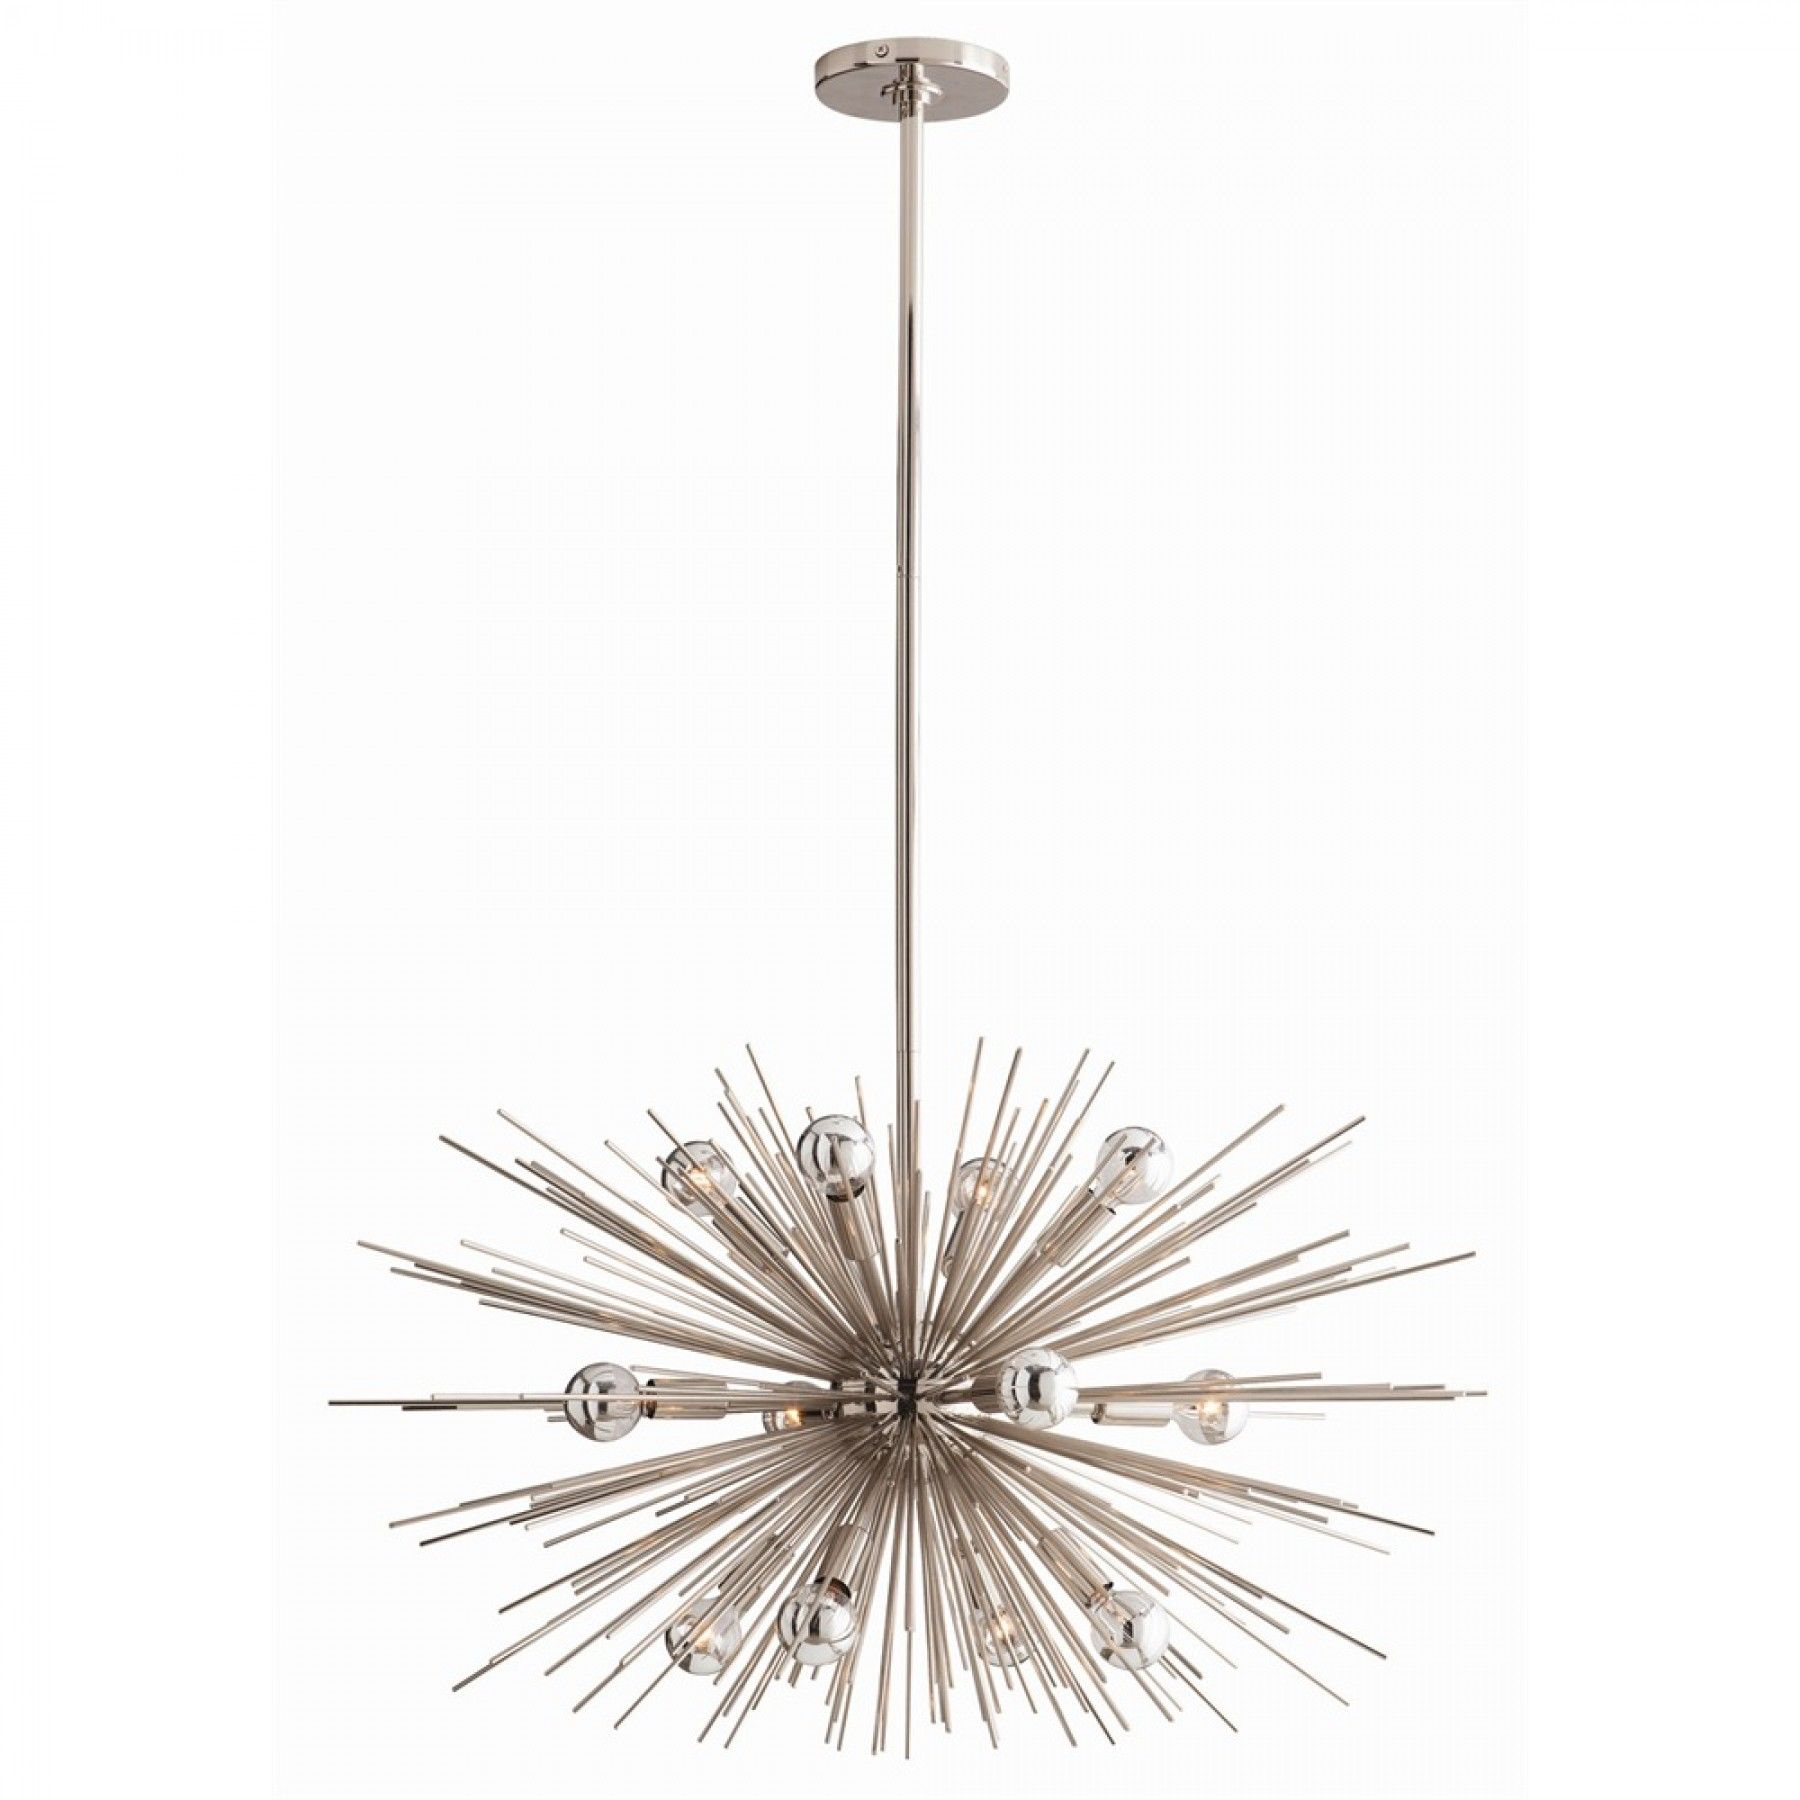 Zanadoo small chandelier 35 dolores lights pinterest zanadoo small chandelier sputnik arubaitofo Images